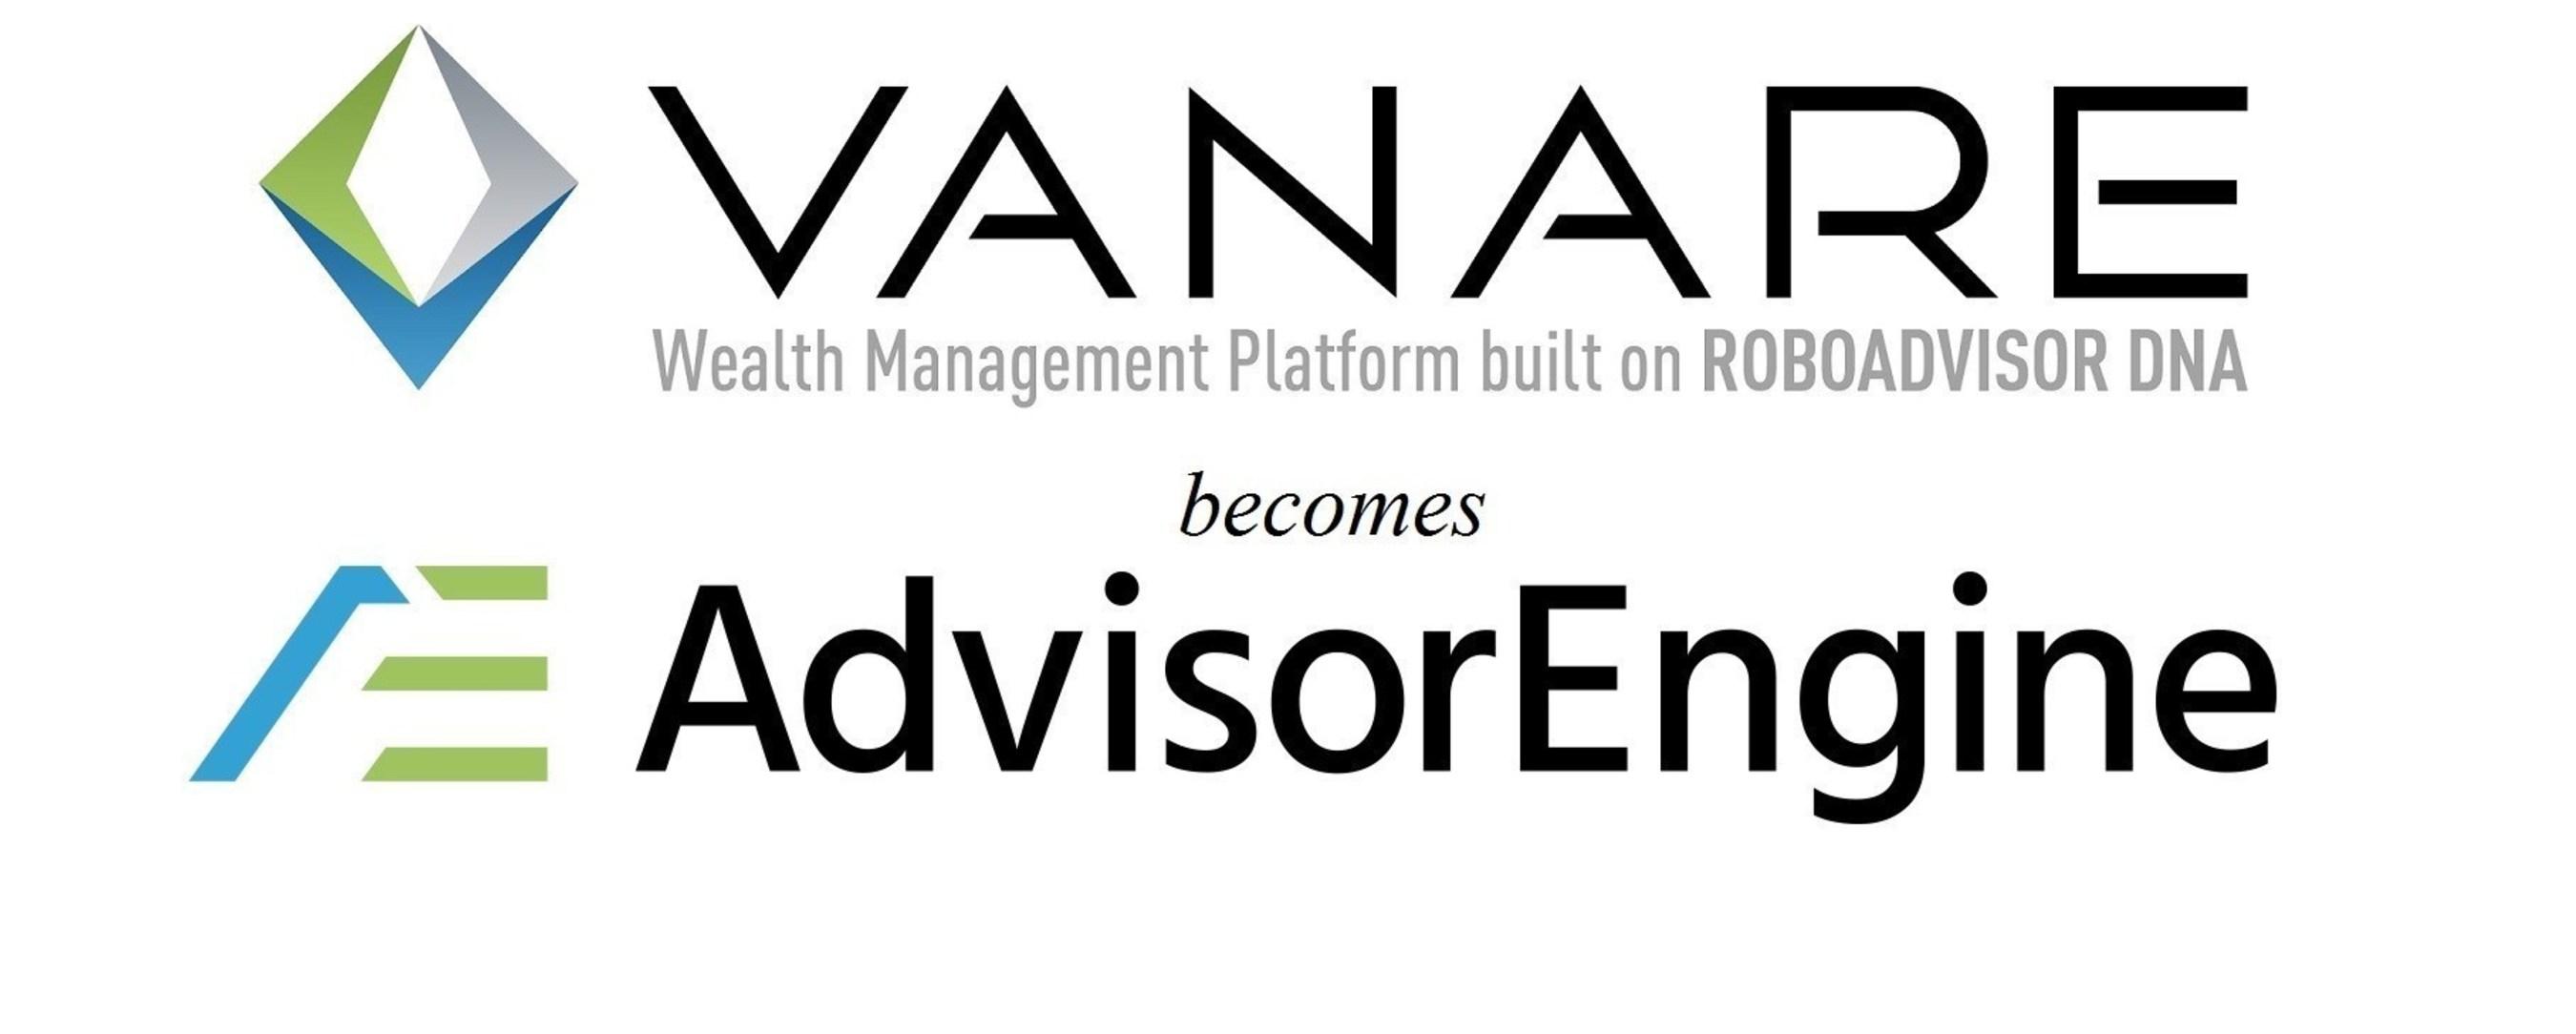 Vanare Raises $20 Million in Series A Financing; Announces Company Name Change